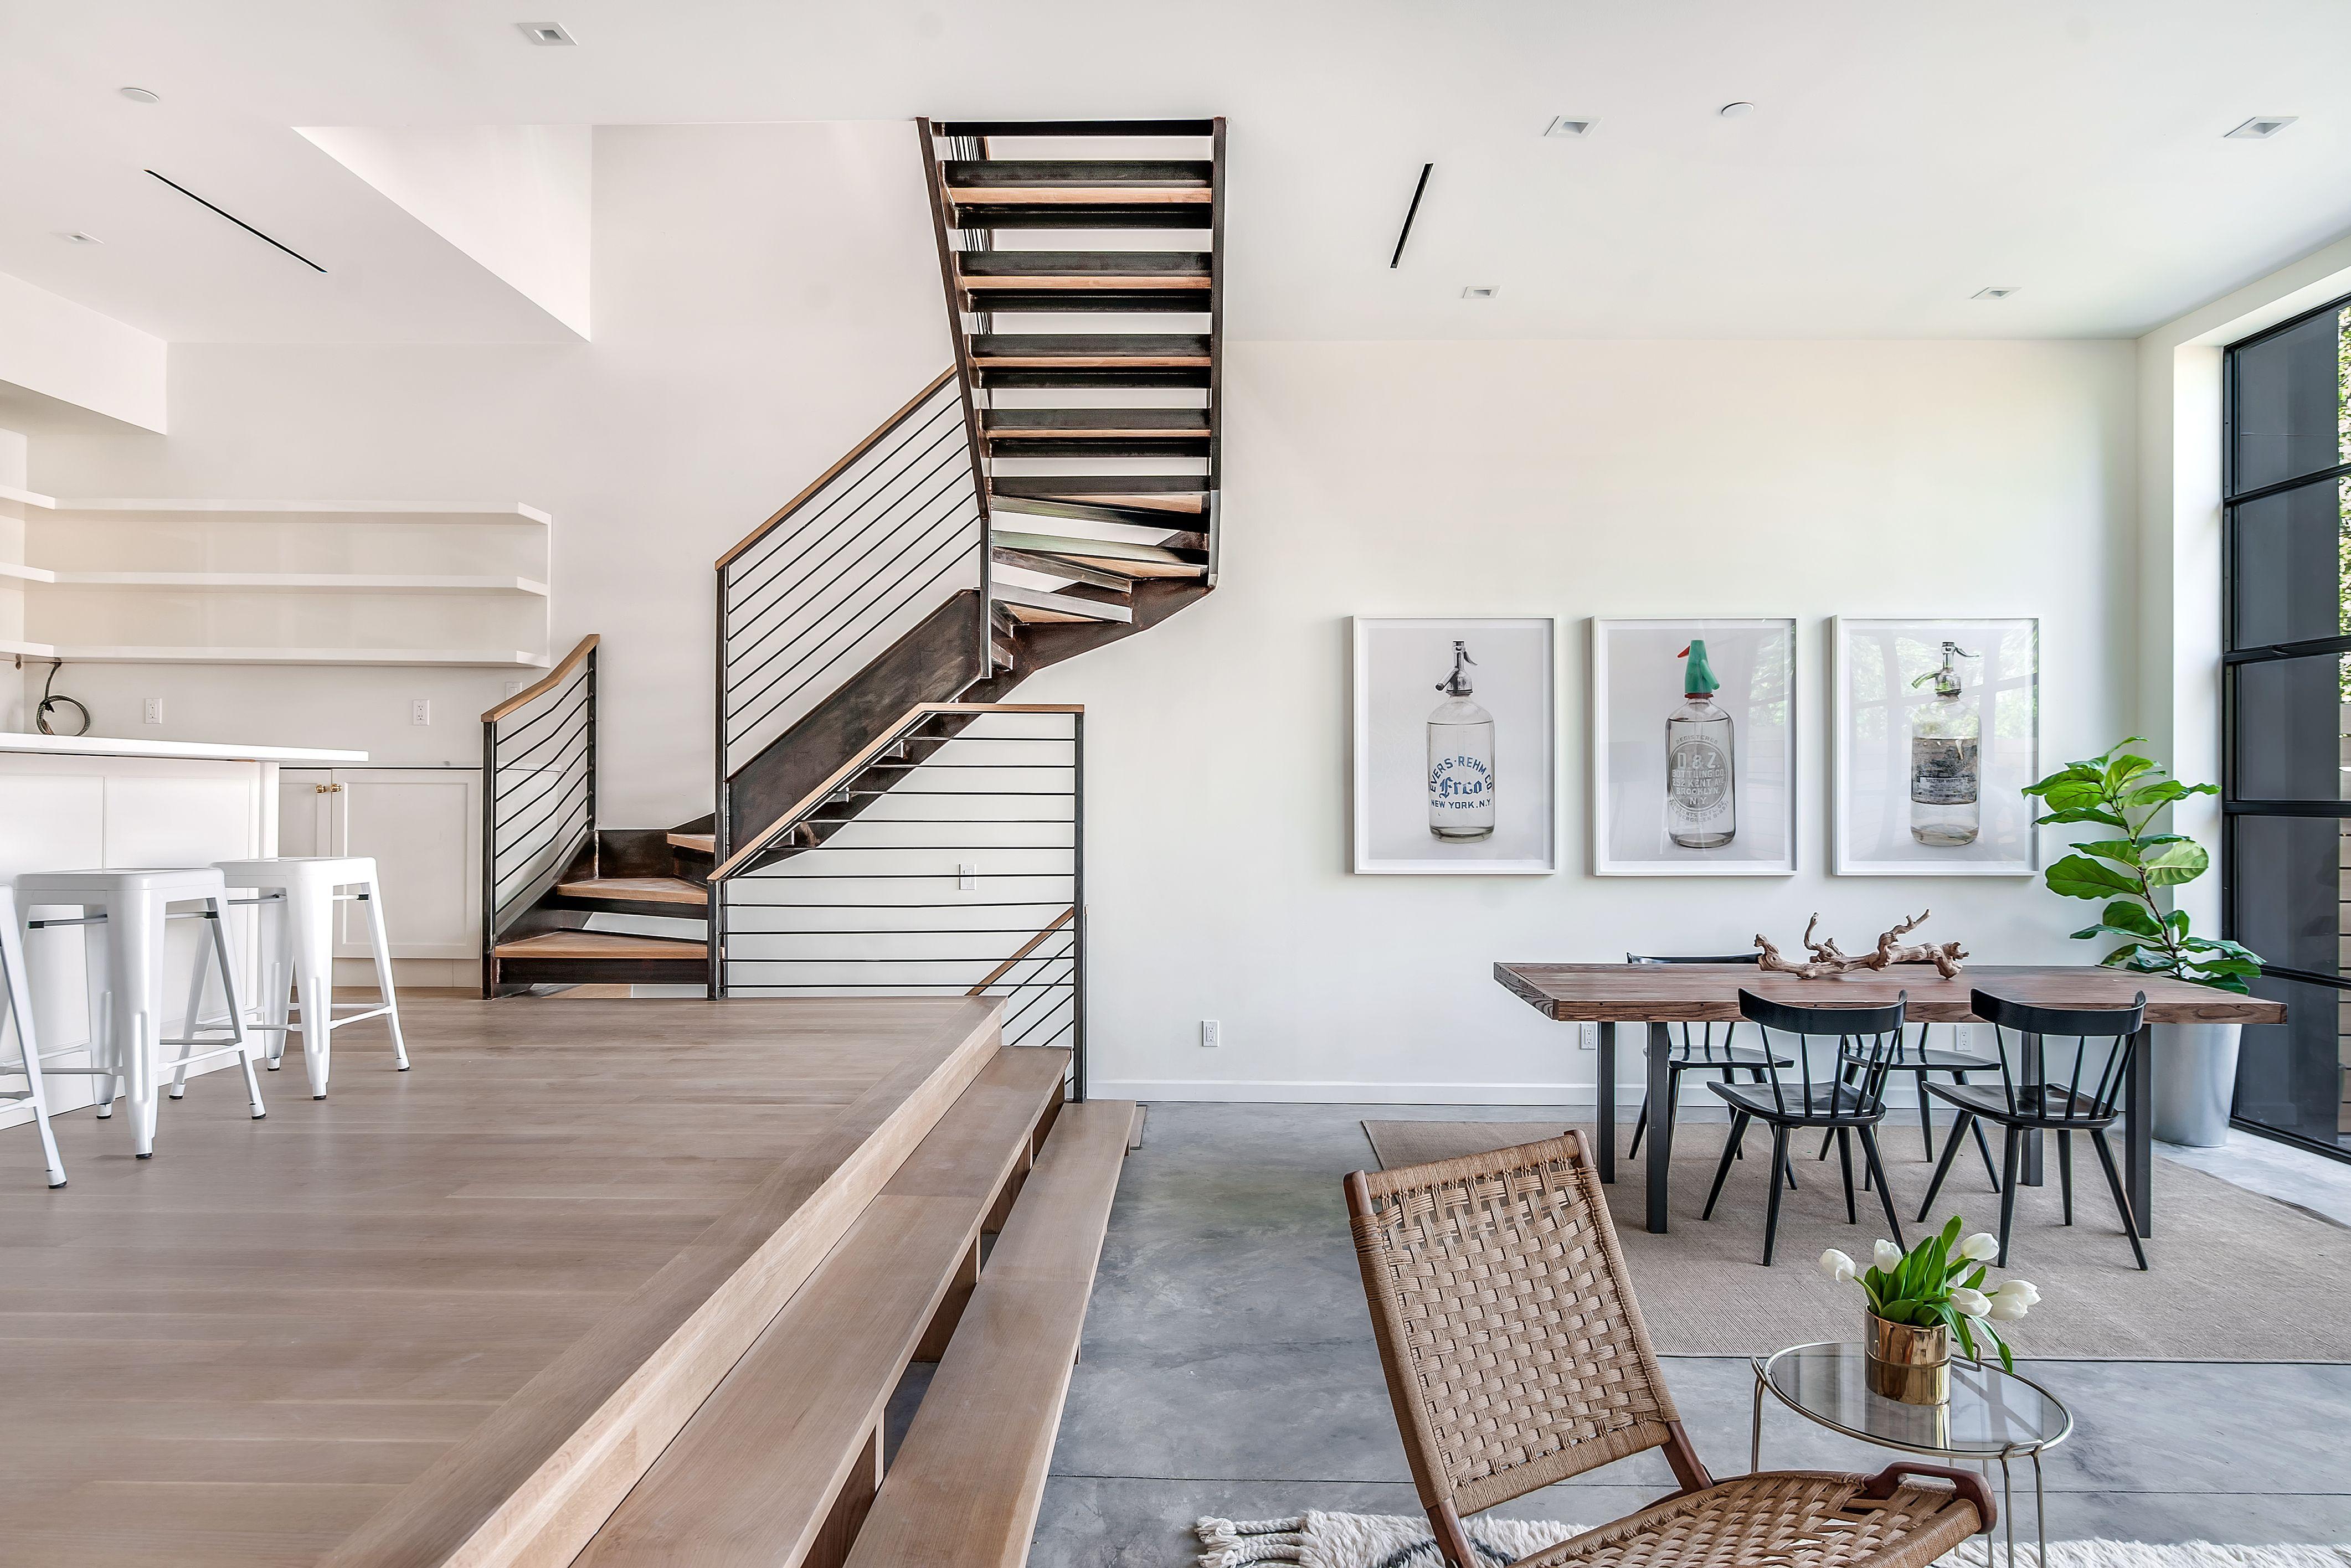 versetzte ebenen holz fussboden dachschraege design, south slope house by elizabeth dooley | . space . wide | pinterest, Design ideen